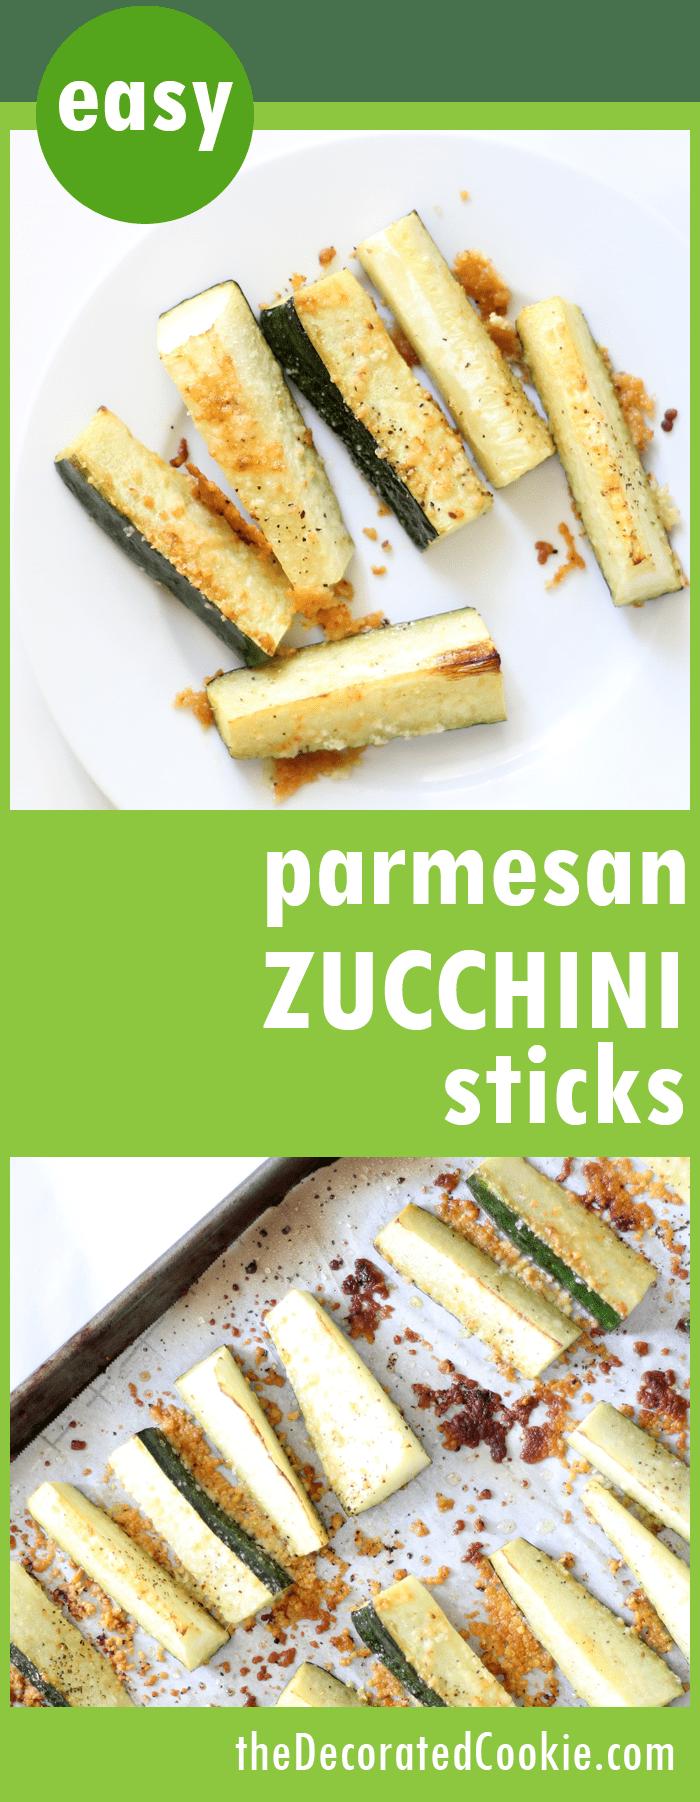 EASY baked Parmesan zucchini sticks -- vegetable side dish idea